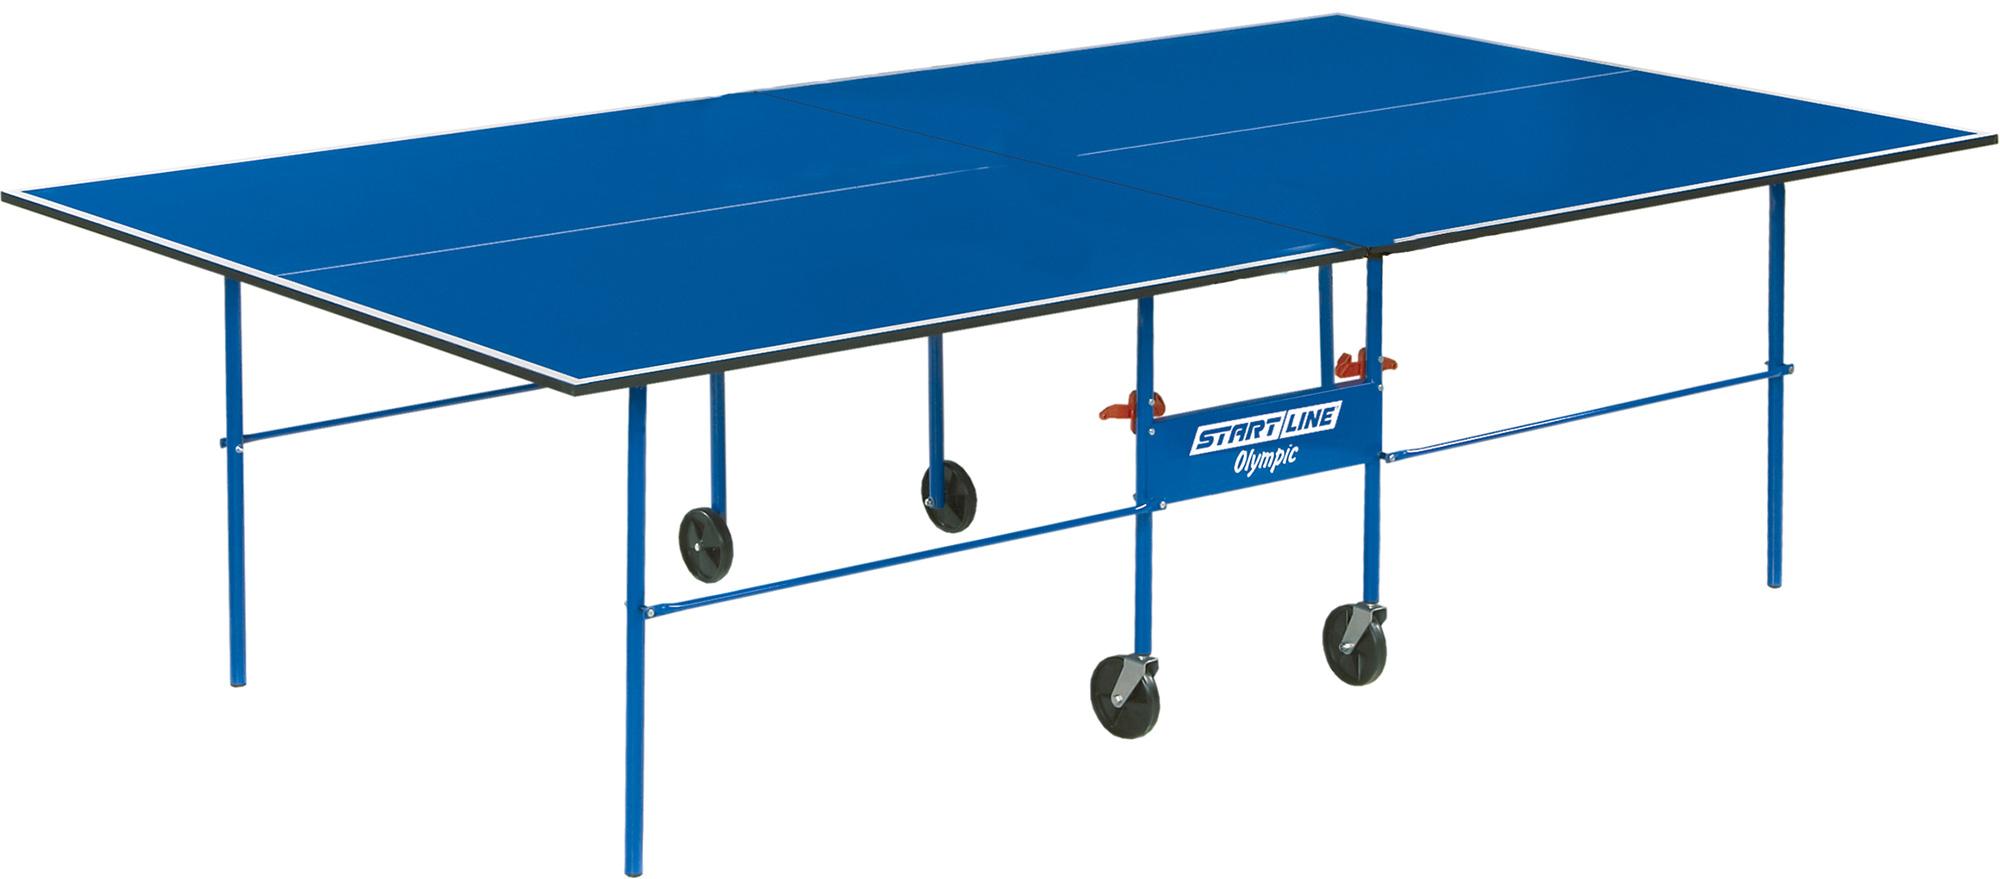 Start line Теннисный стол для помещений START LINE Olympic start line стол н т start line compact lx с сеткой